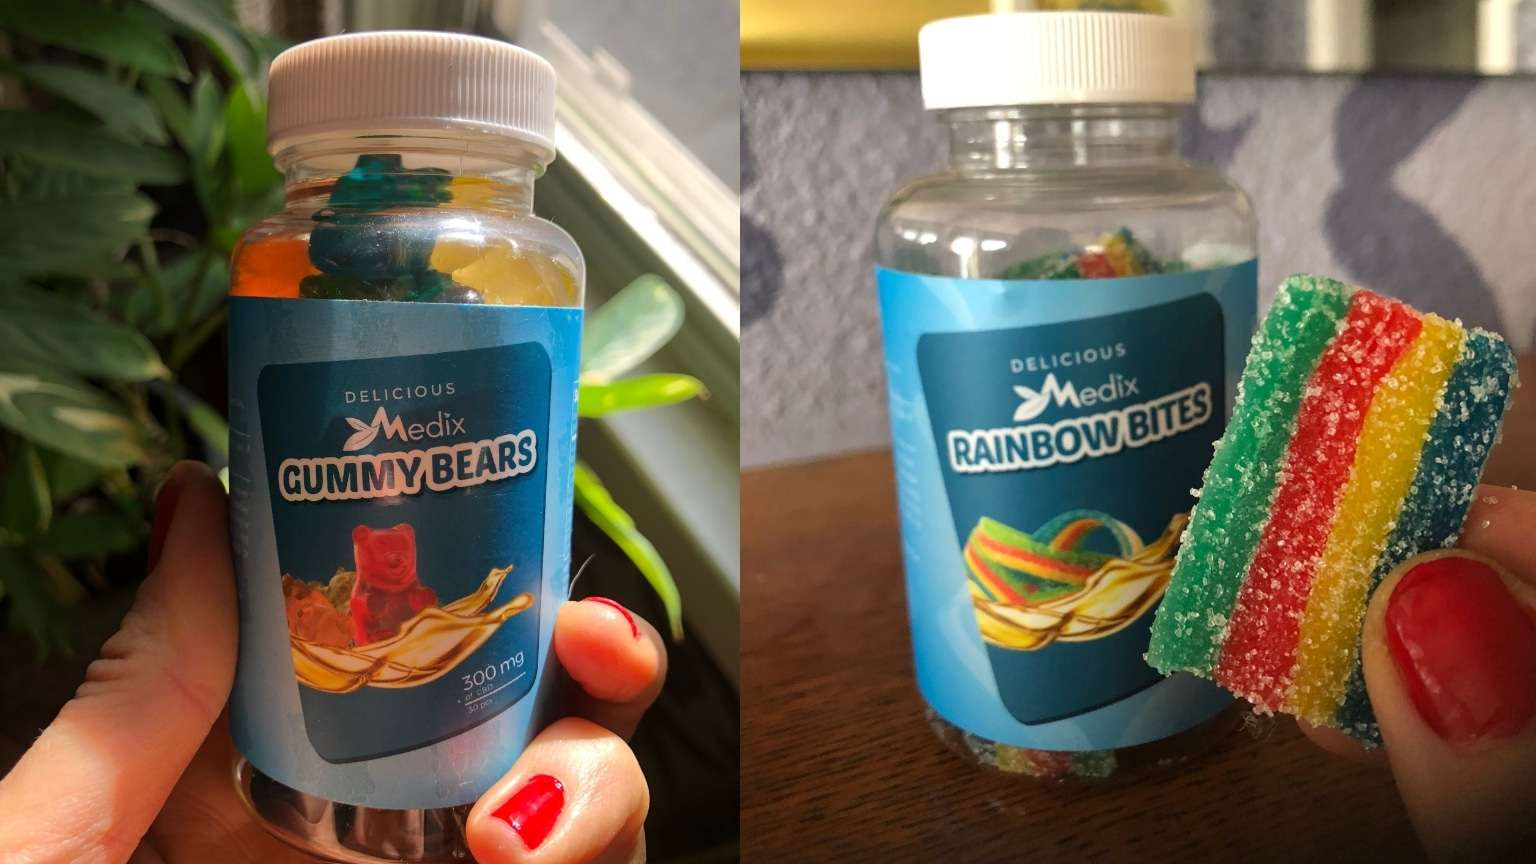 medix-cbd-gummies-and-candies